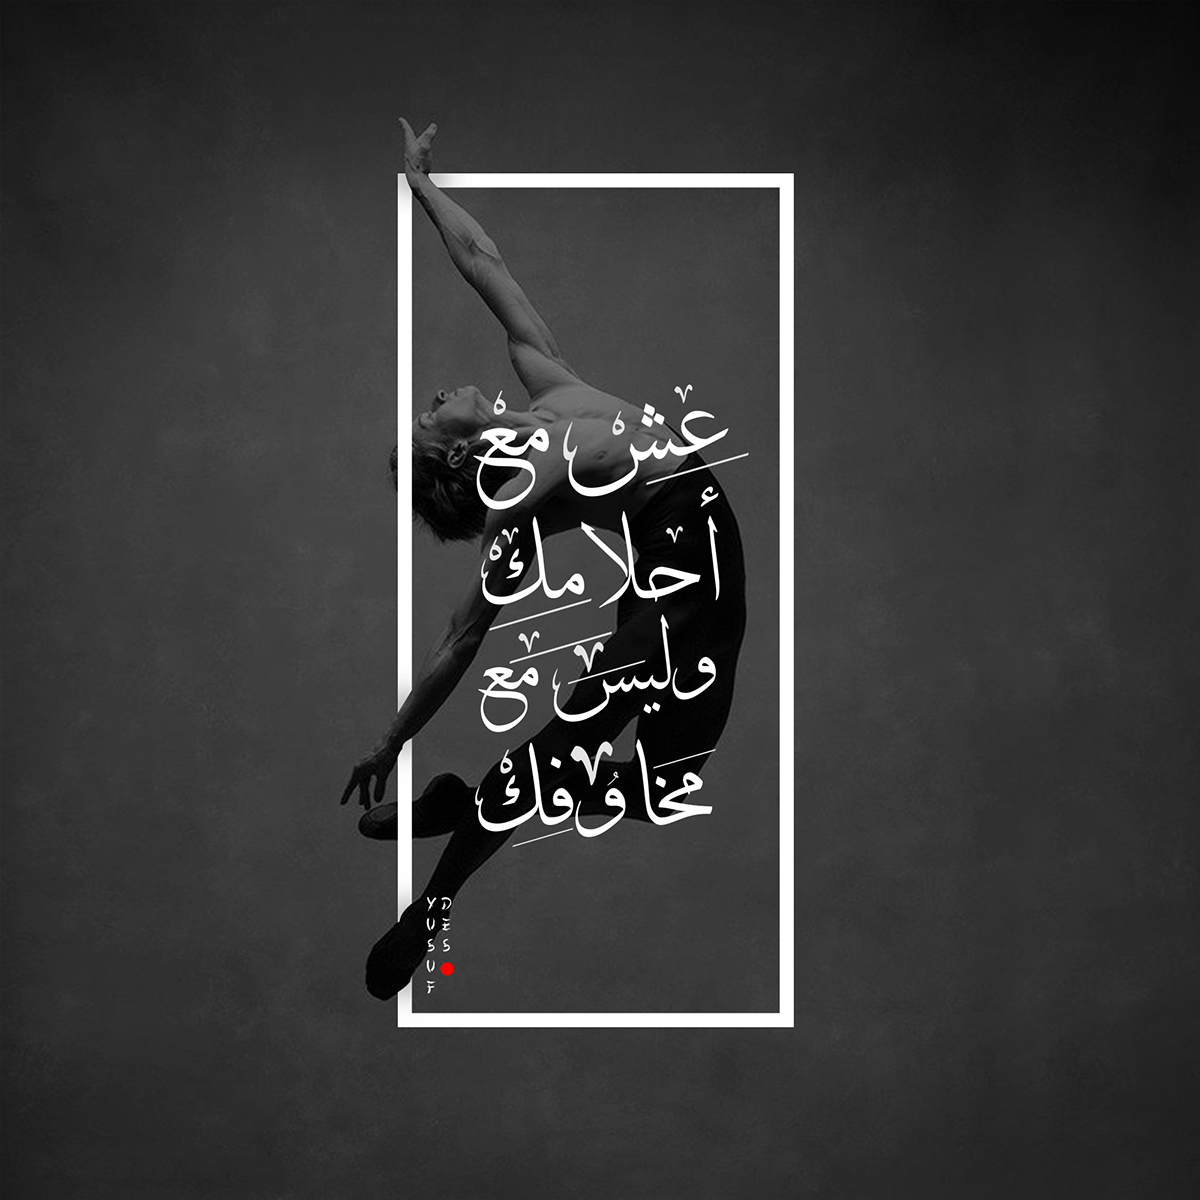 عبارات م لهمة متجدد On Behance Quotes For Book Lovers Beautiful Arabic Words Arabic Quotes